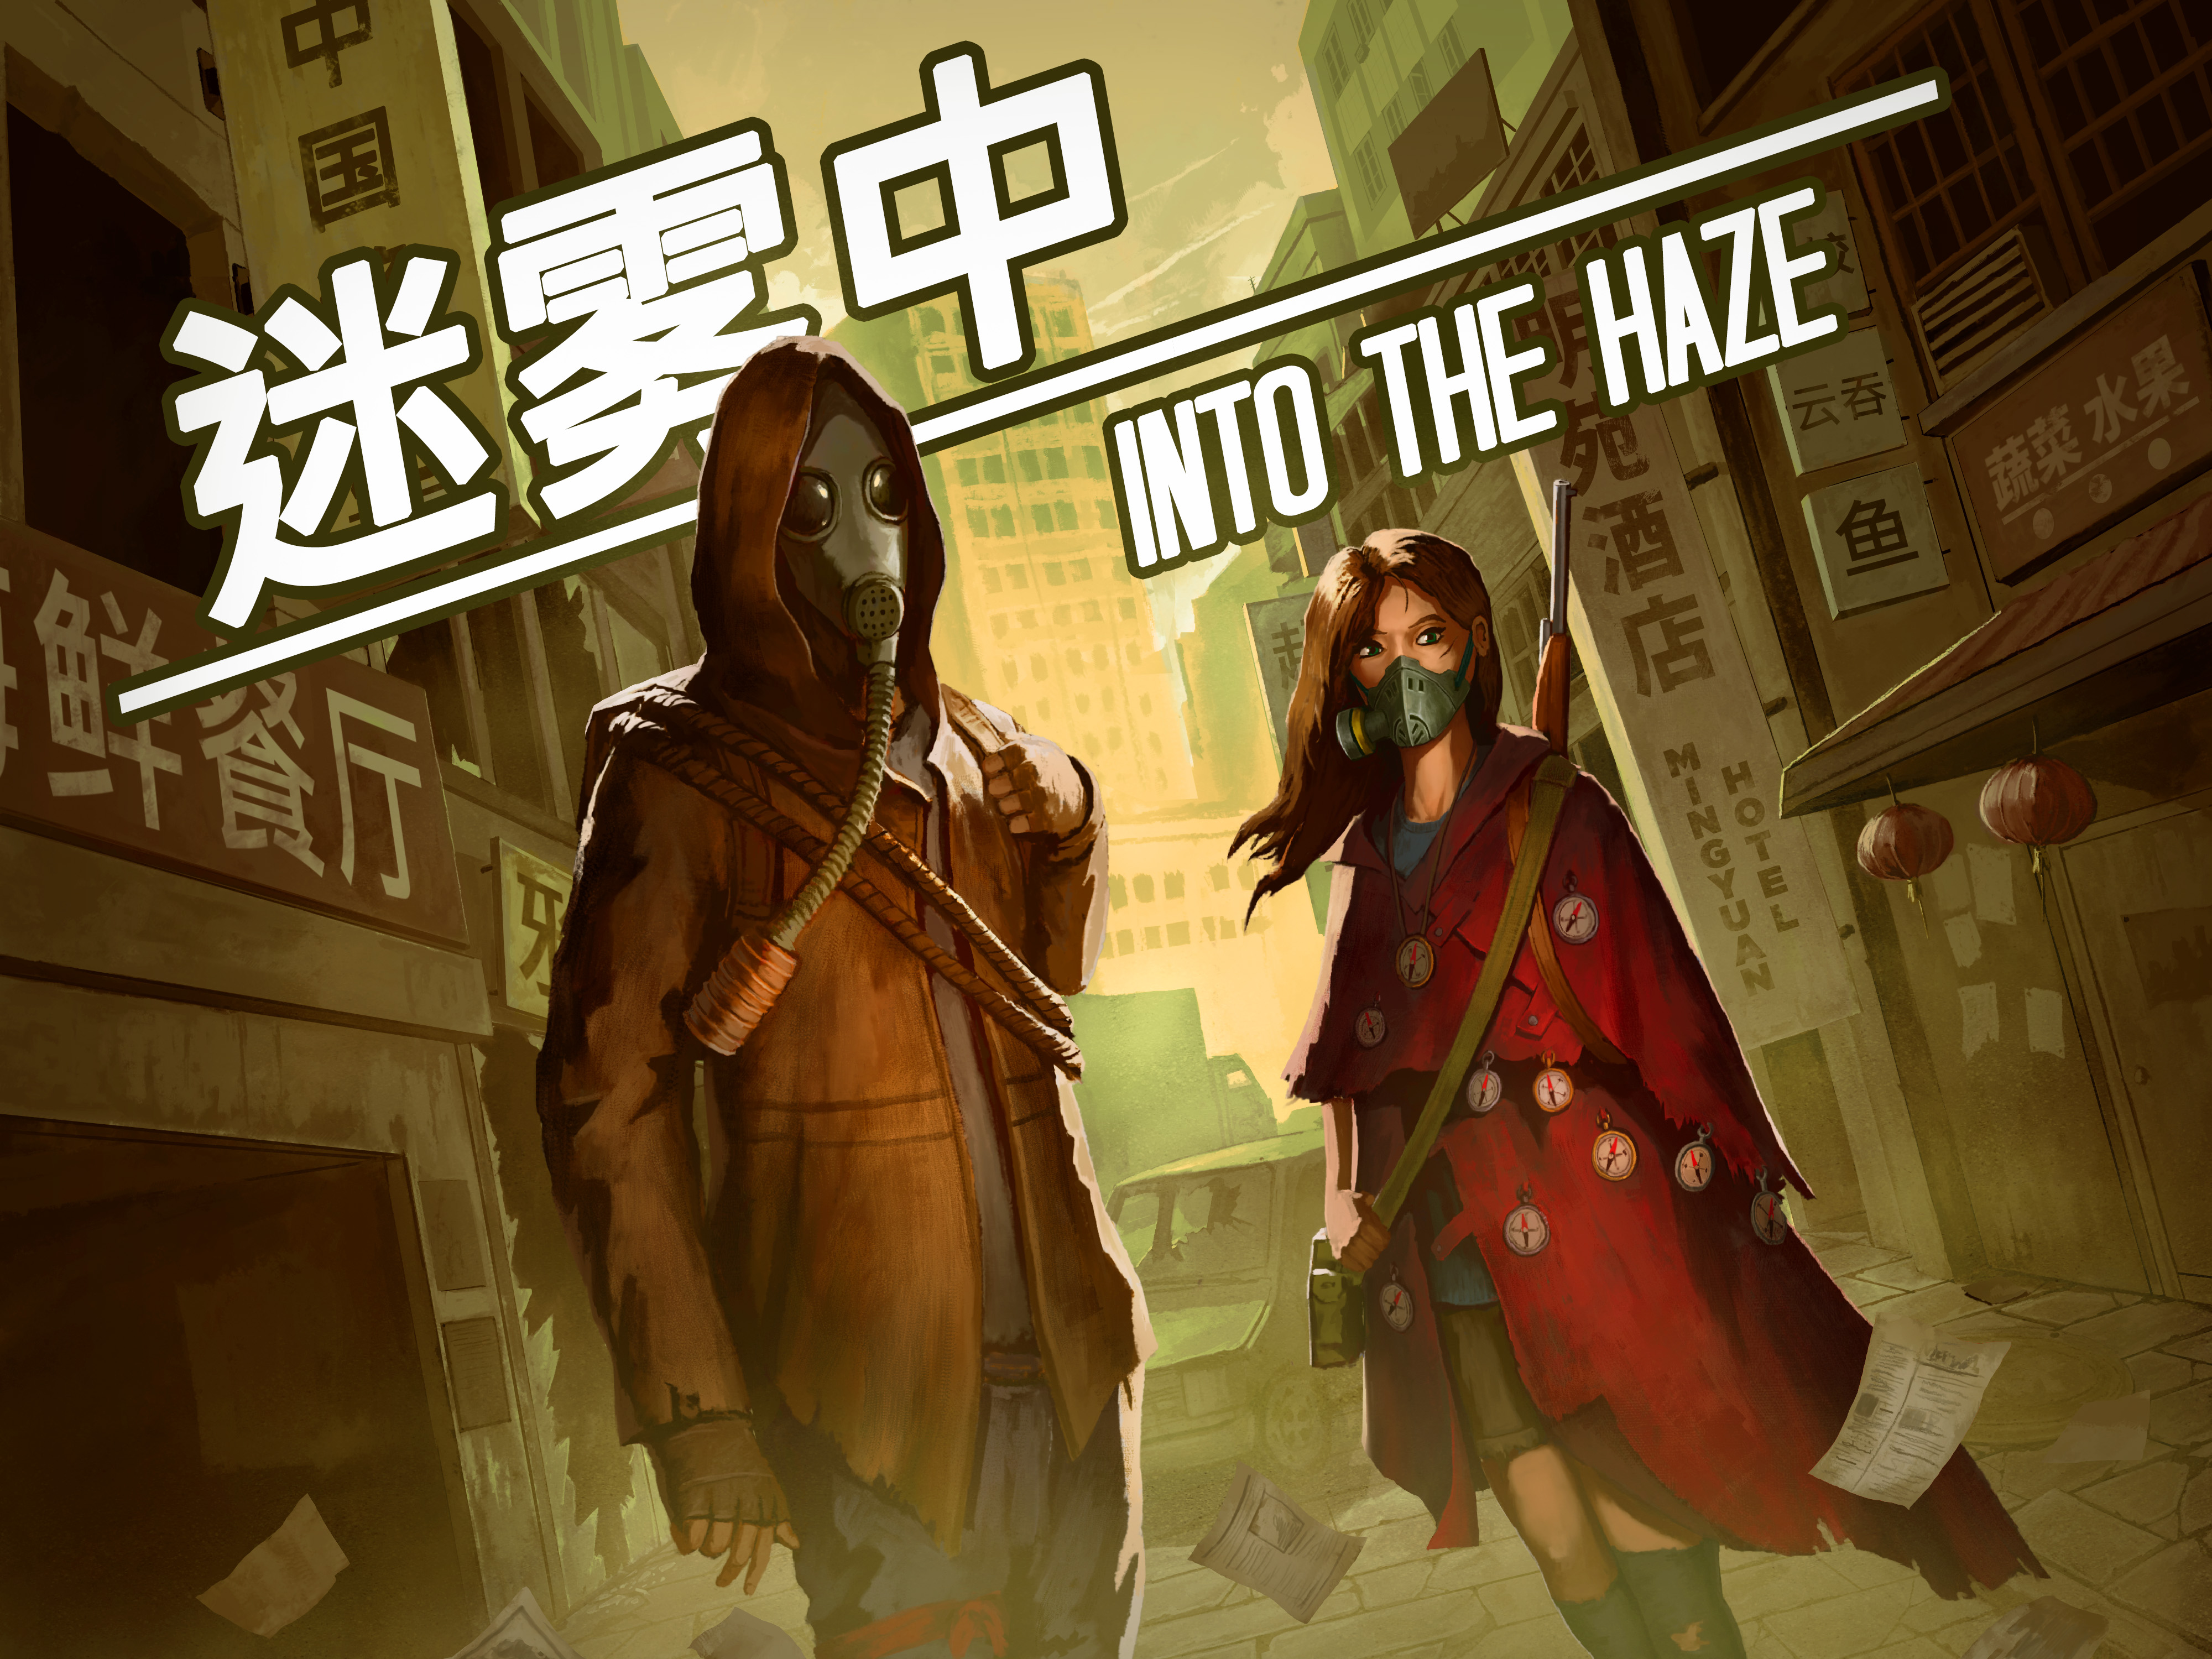 Into the Haze Cover